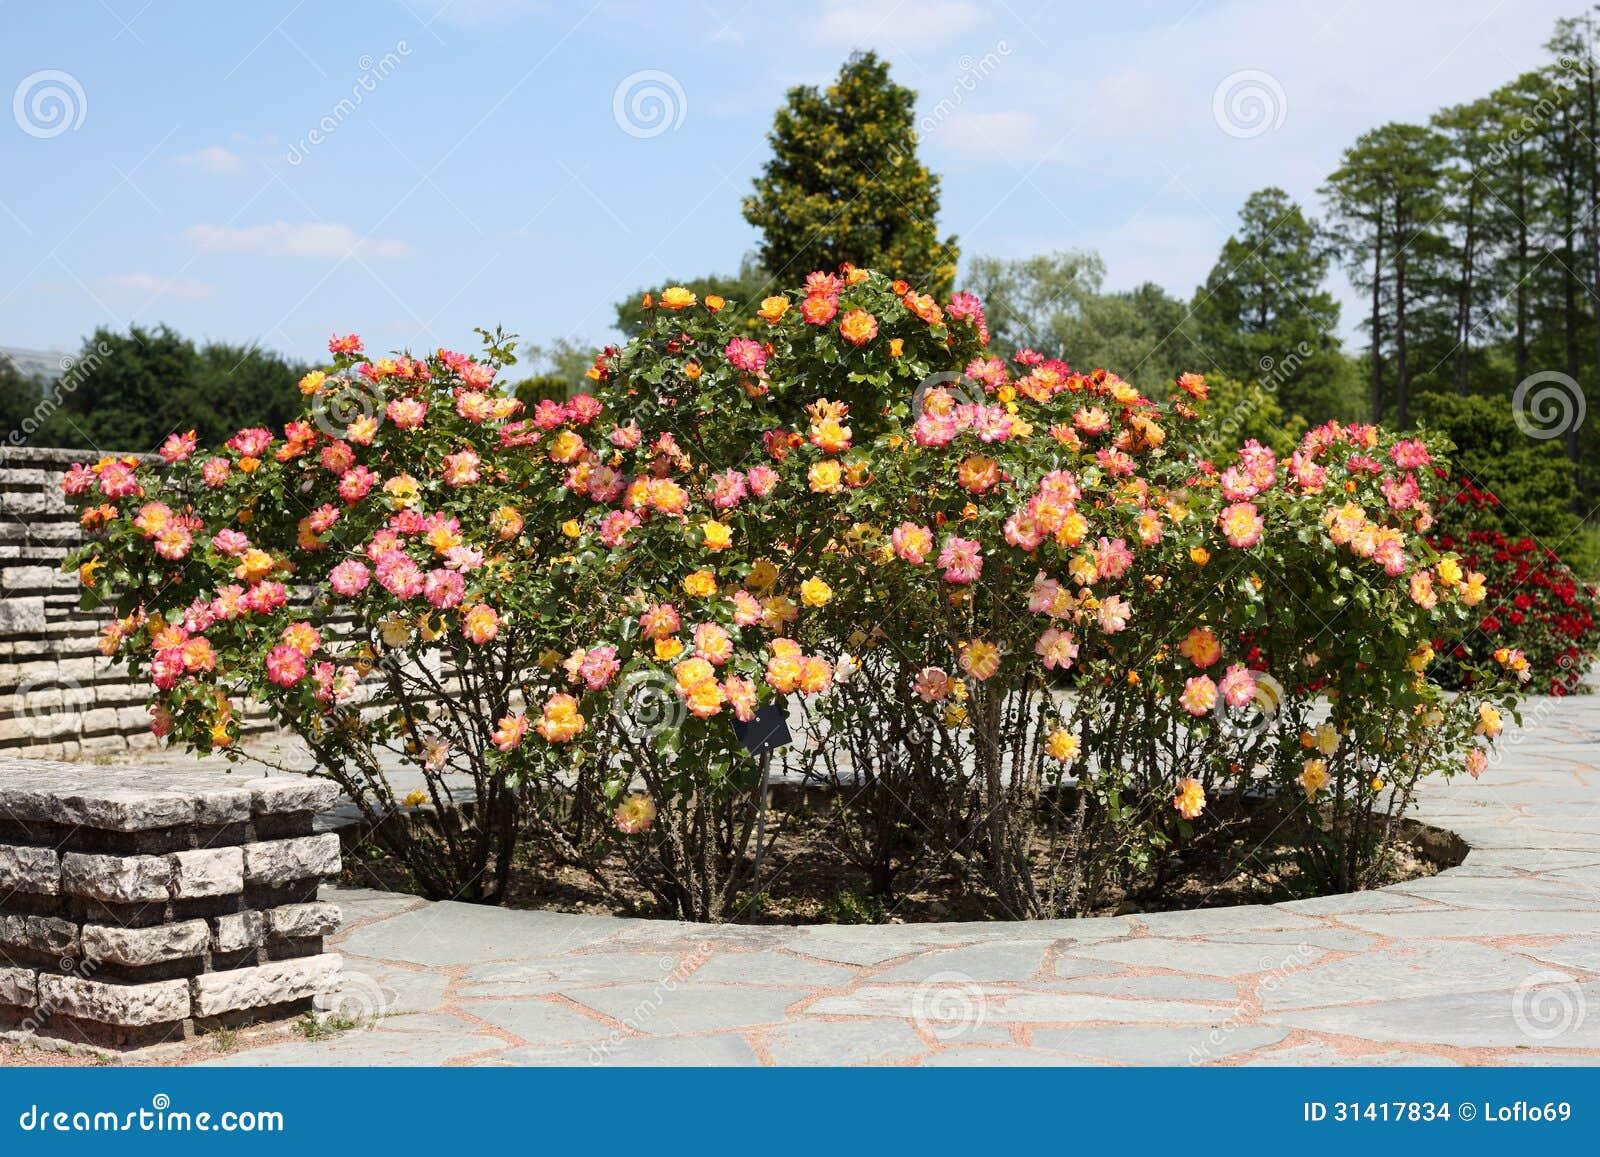 Rose garden stock photo. Image of park, golden, garden - 31417834